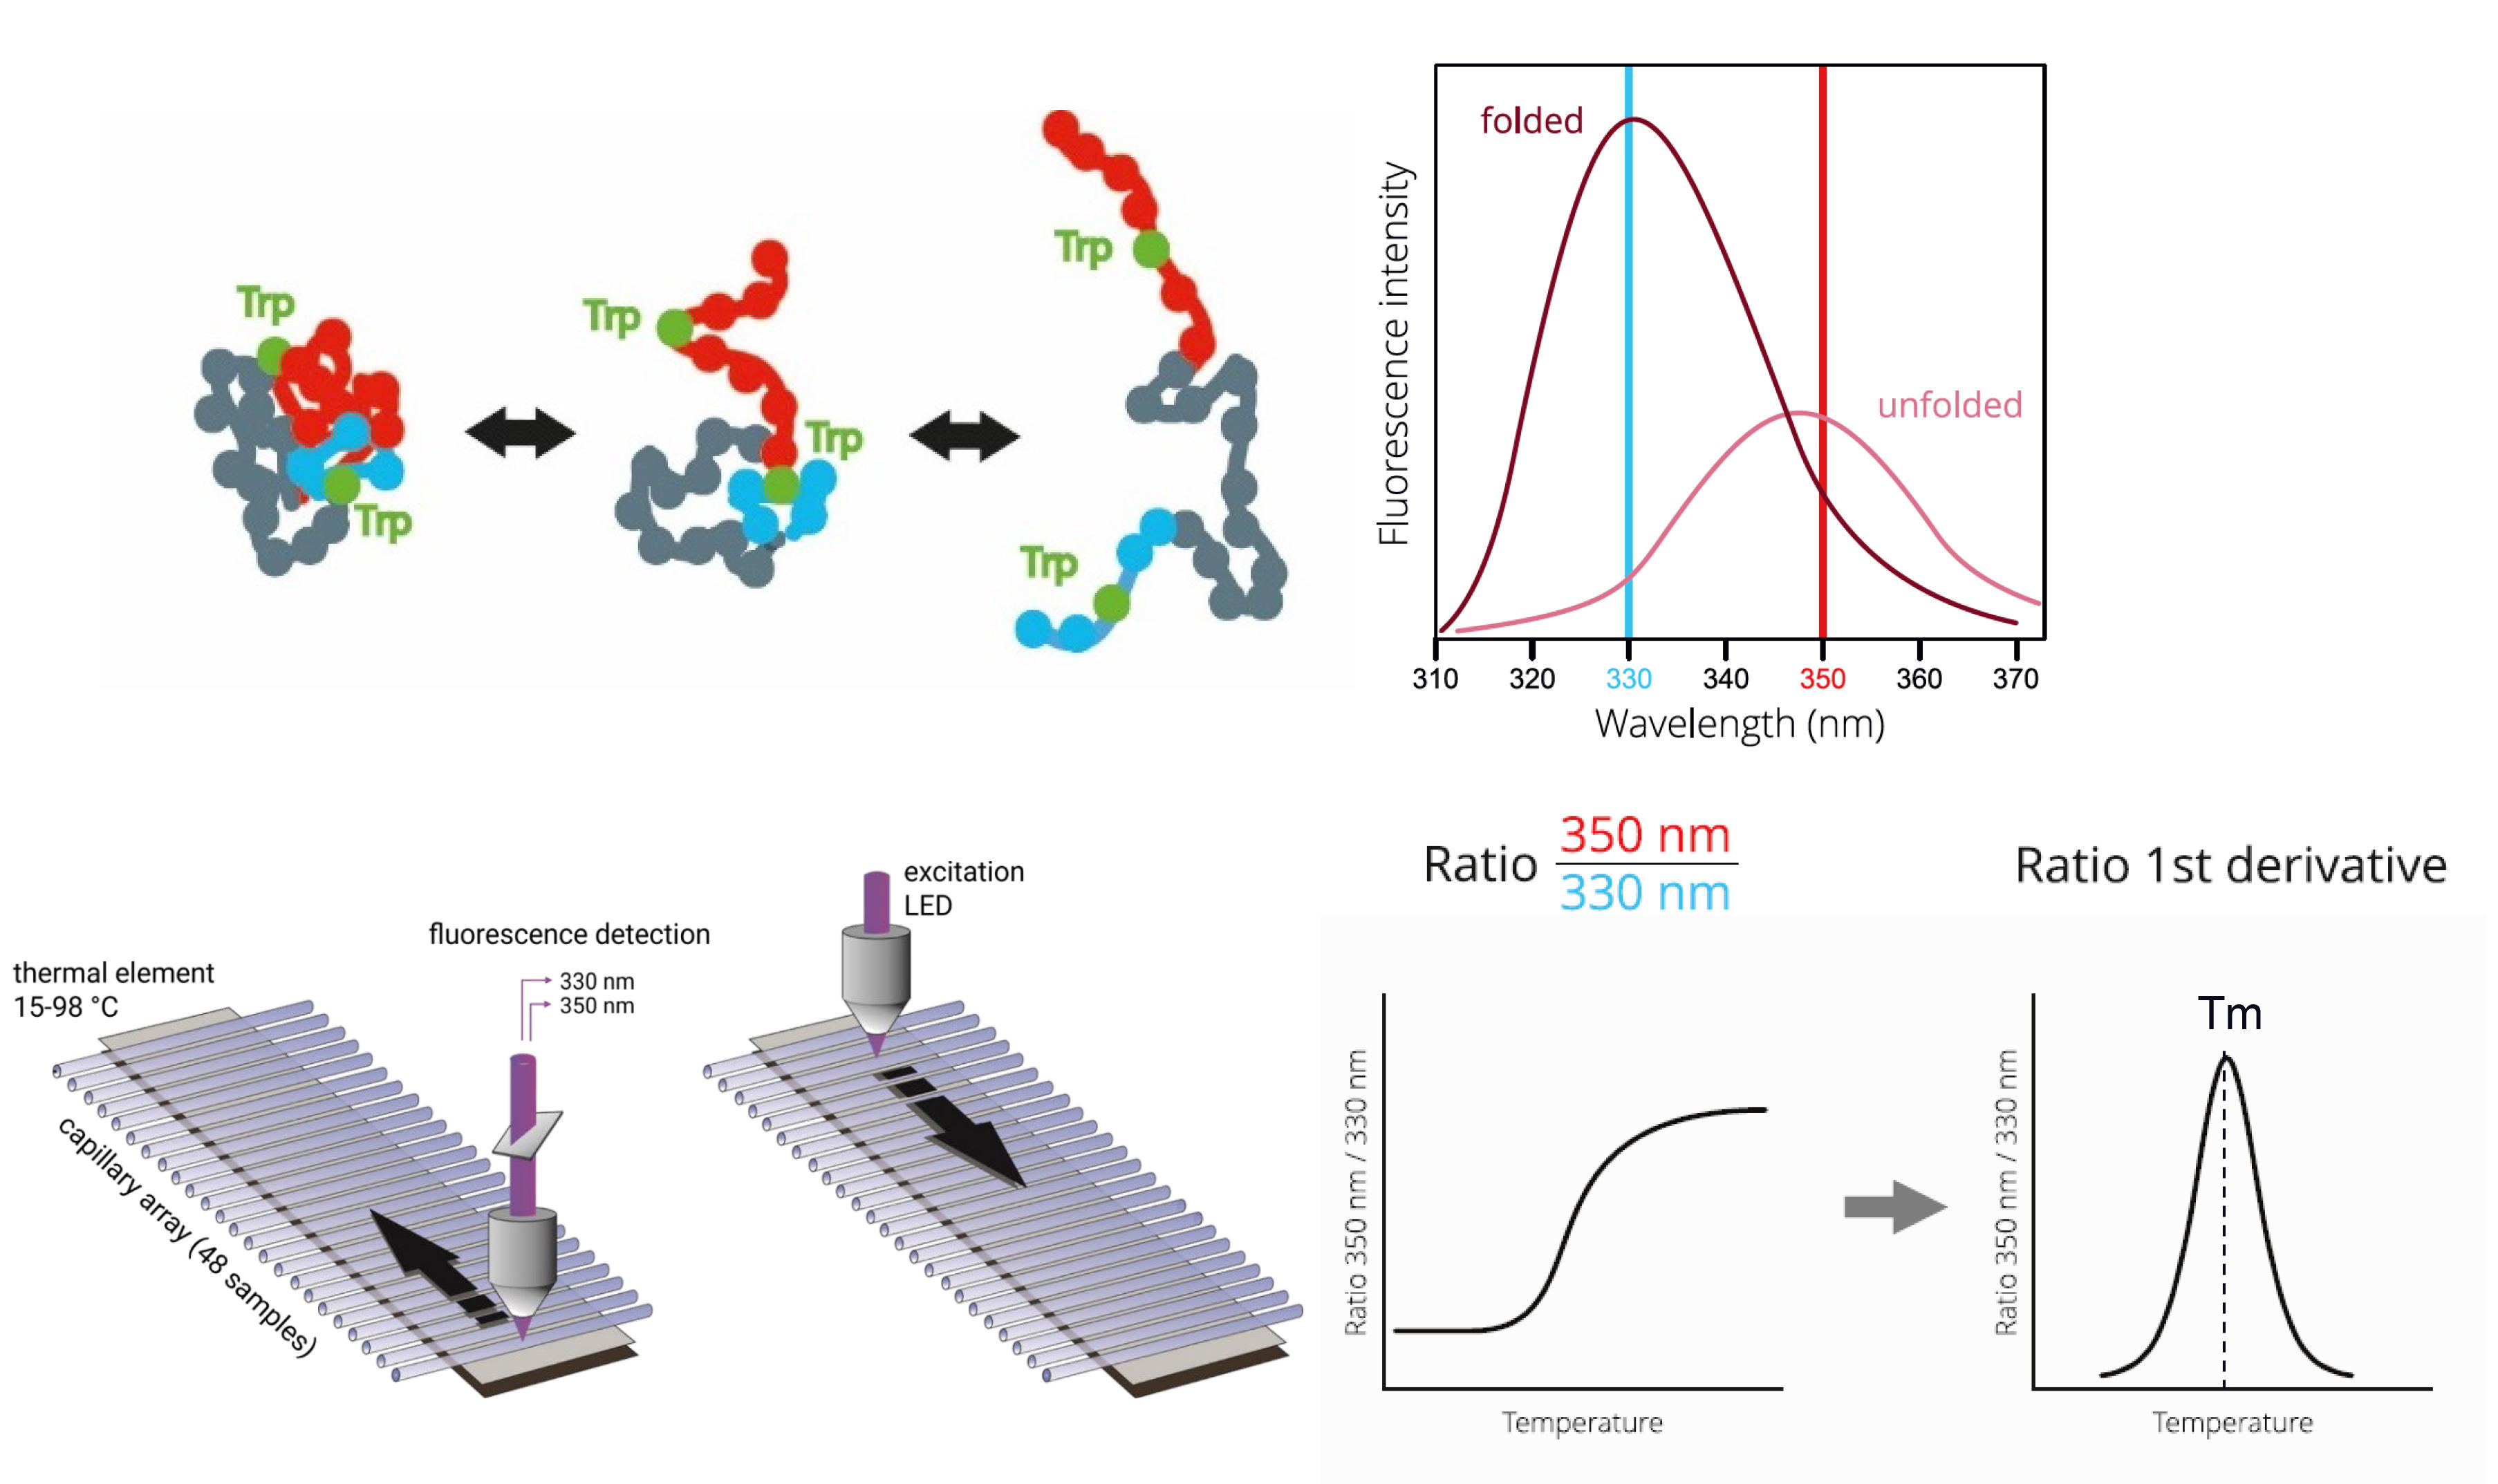 nanoDSFアッセイの原理と測定フロー